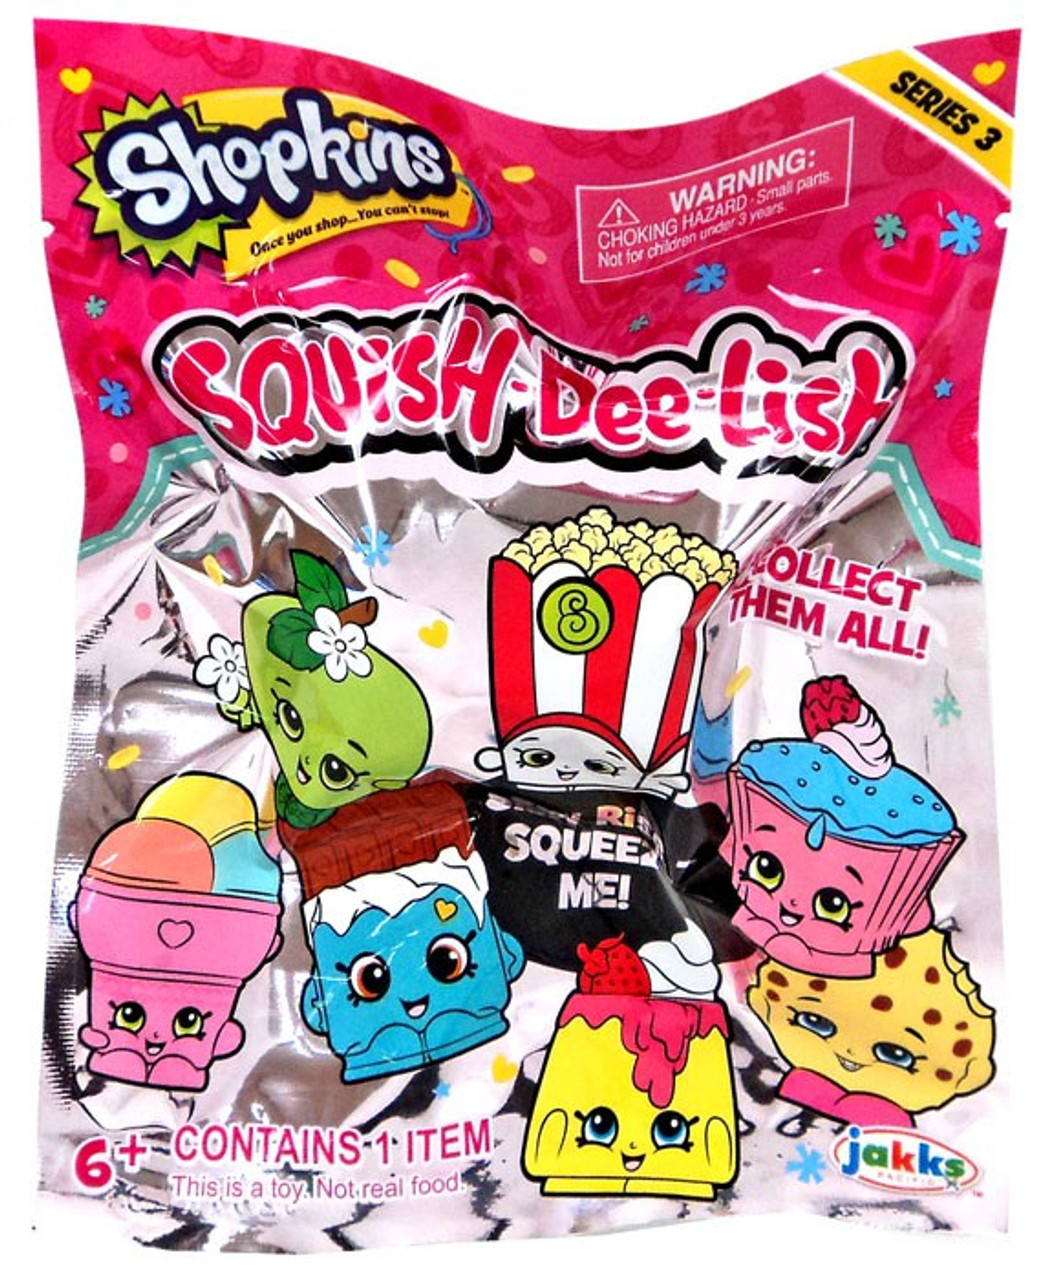 Squish Dee Lish Collection : Squish-Dee-Lish Shopkins Series 3 Mystery Pack Jakks Pacific - ToyWiz